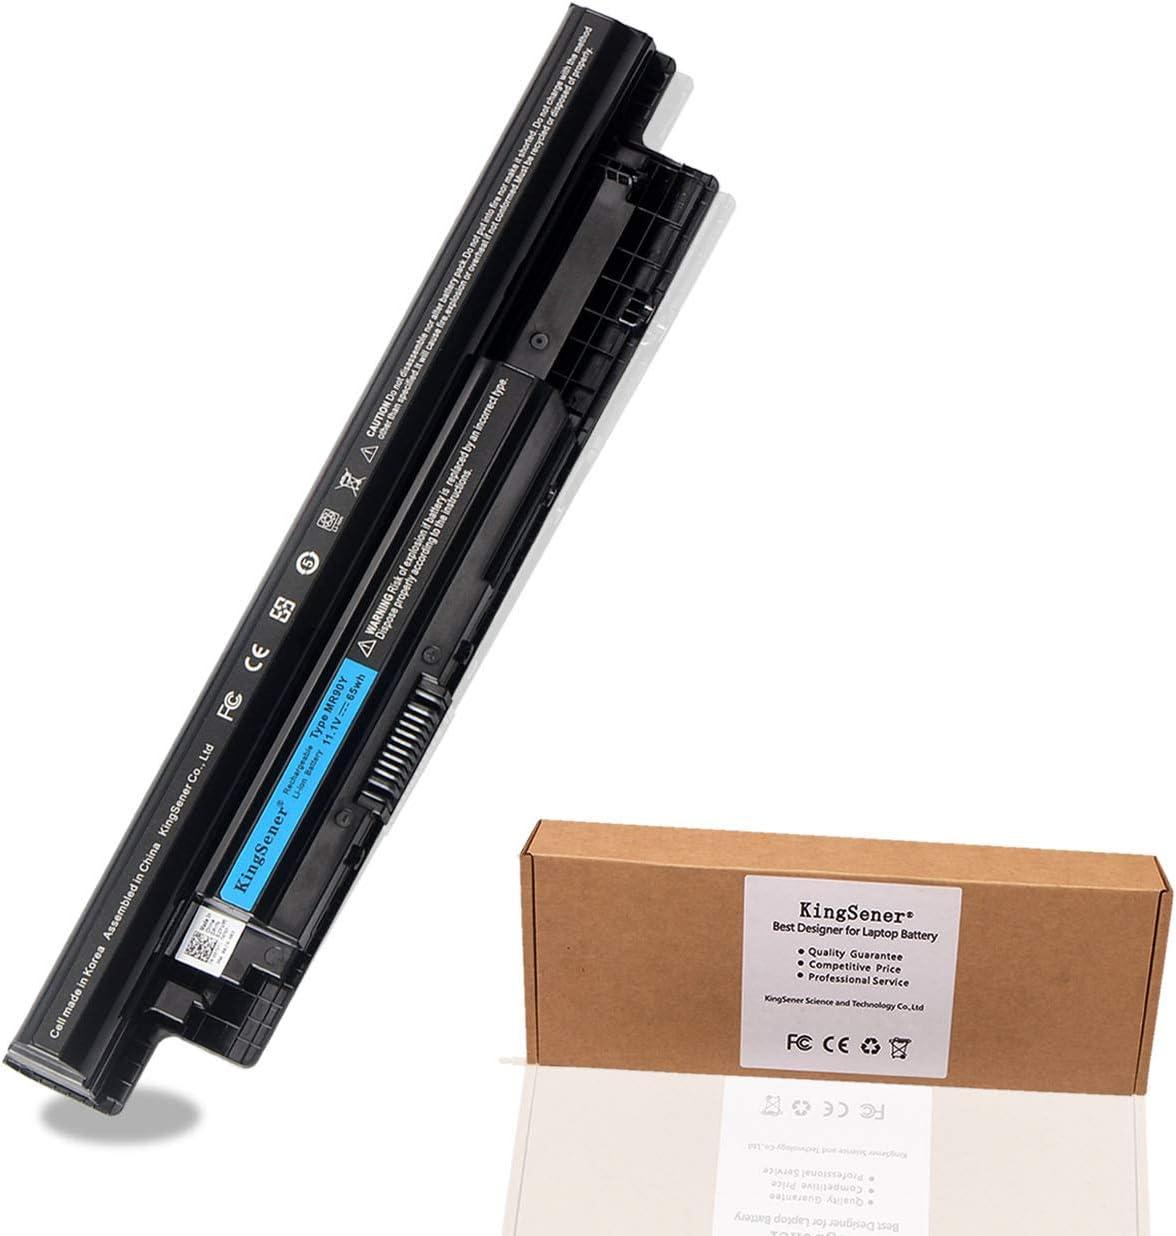 KingSener MR90Y Laptop Battery for DELL Inspiron 3421 3721 5421 5521 5721 3521 3437 5537 Vostro 14-3449 2421 2521 XCMRD 6000mAh